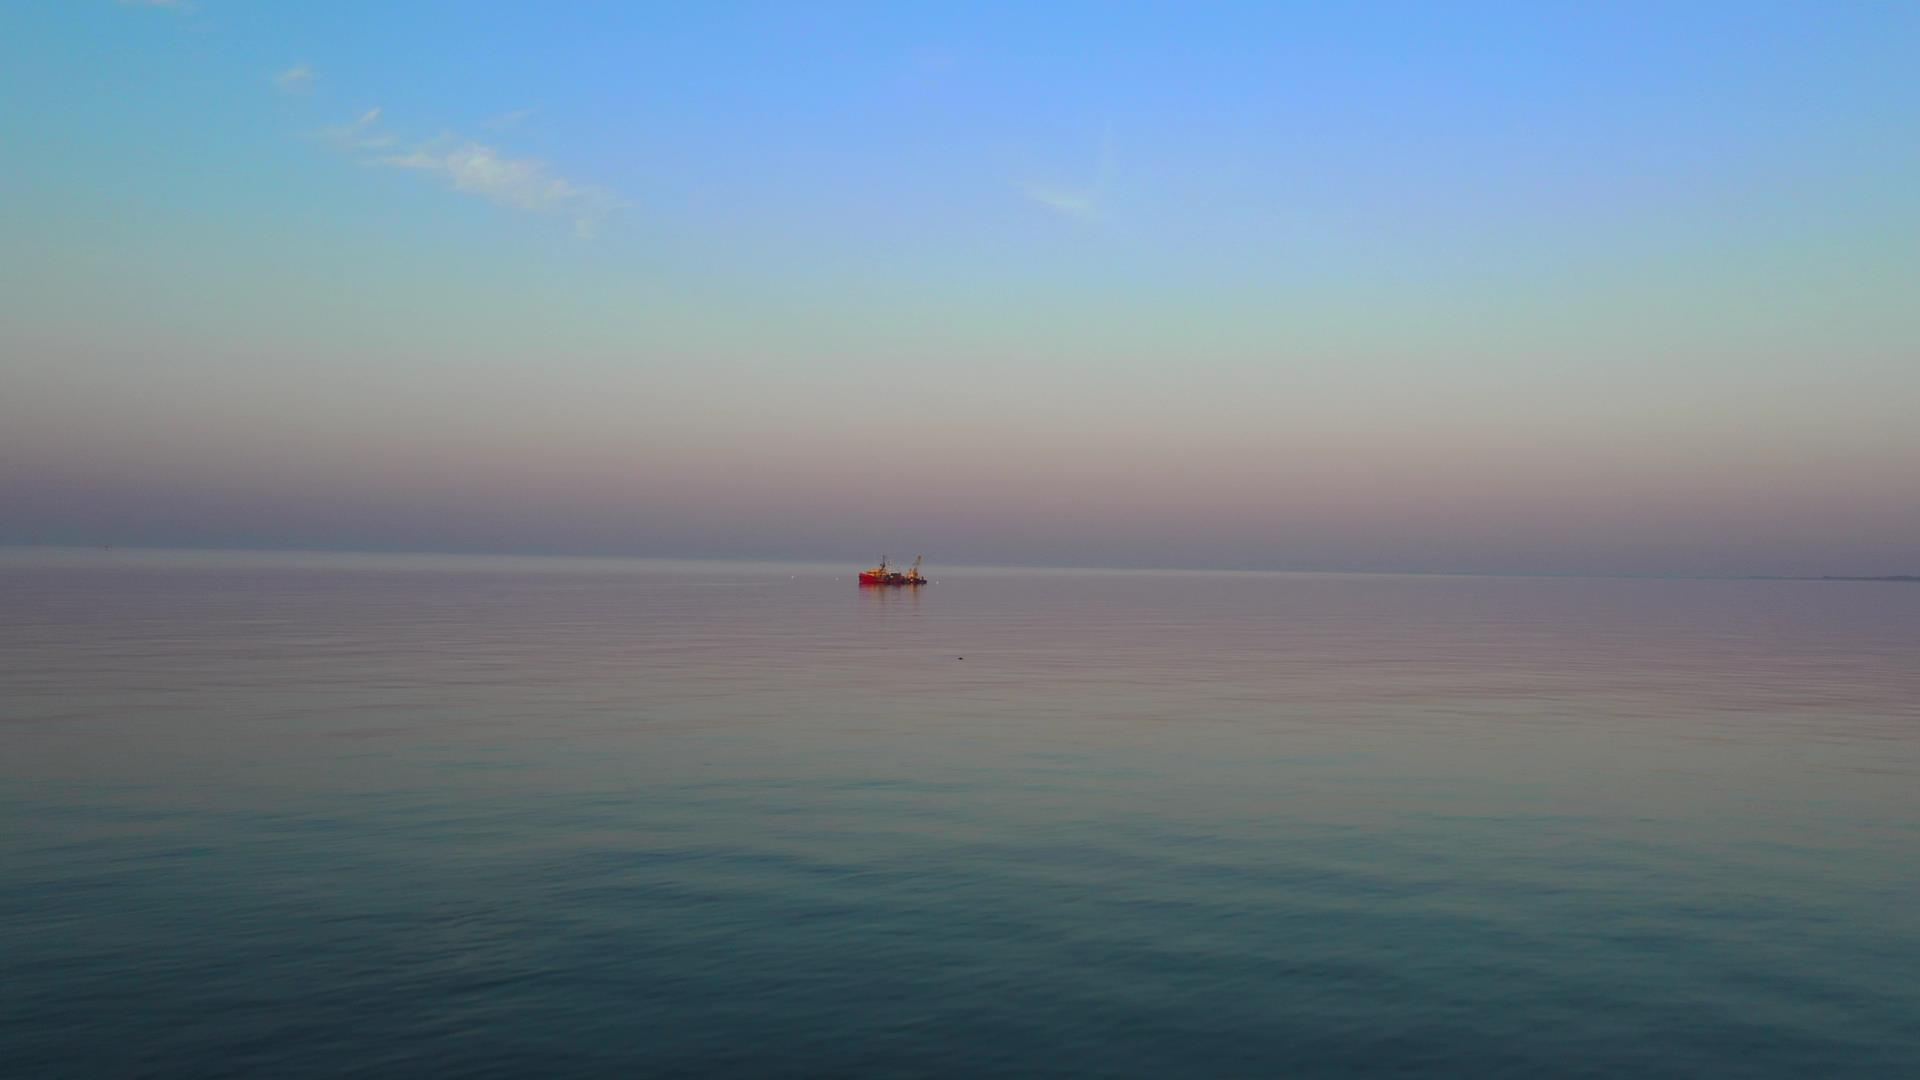 statek2.jpg